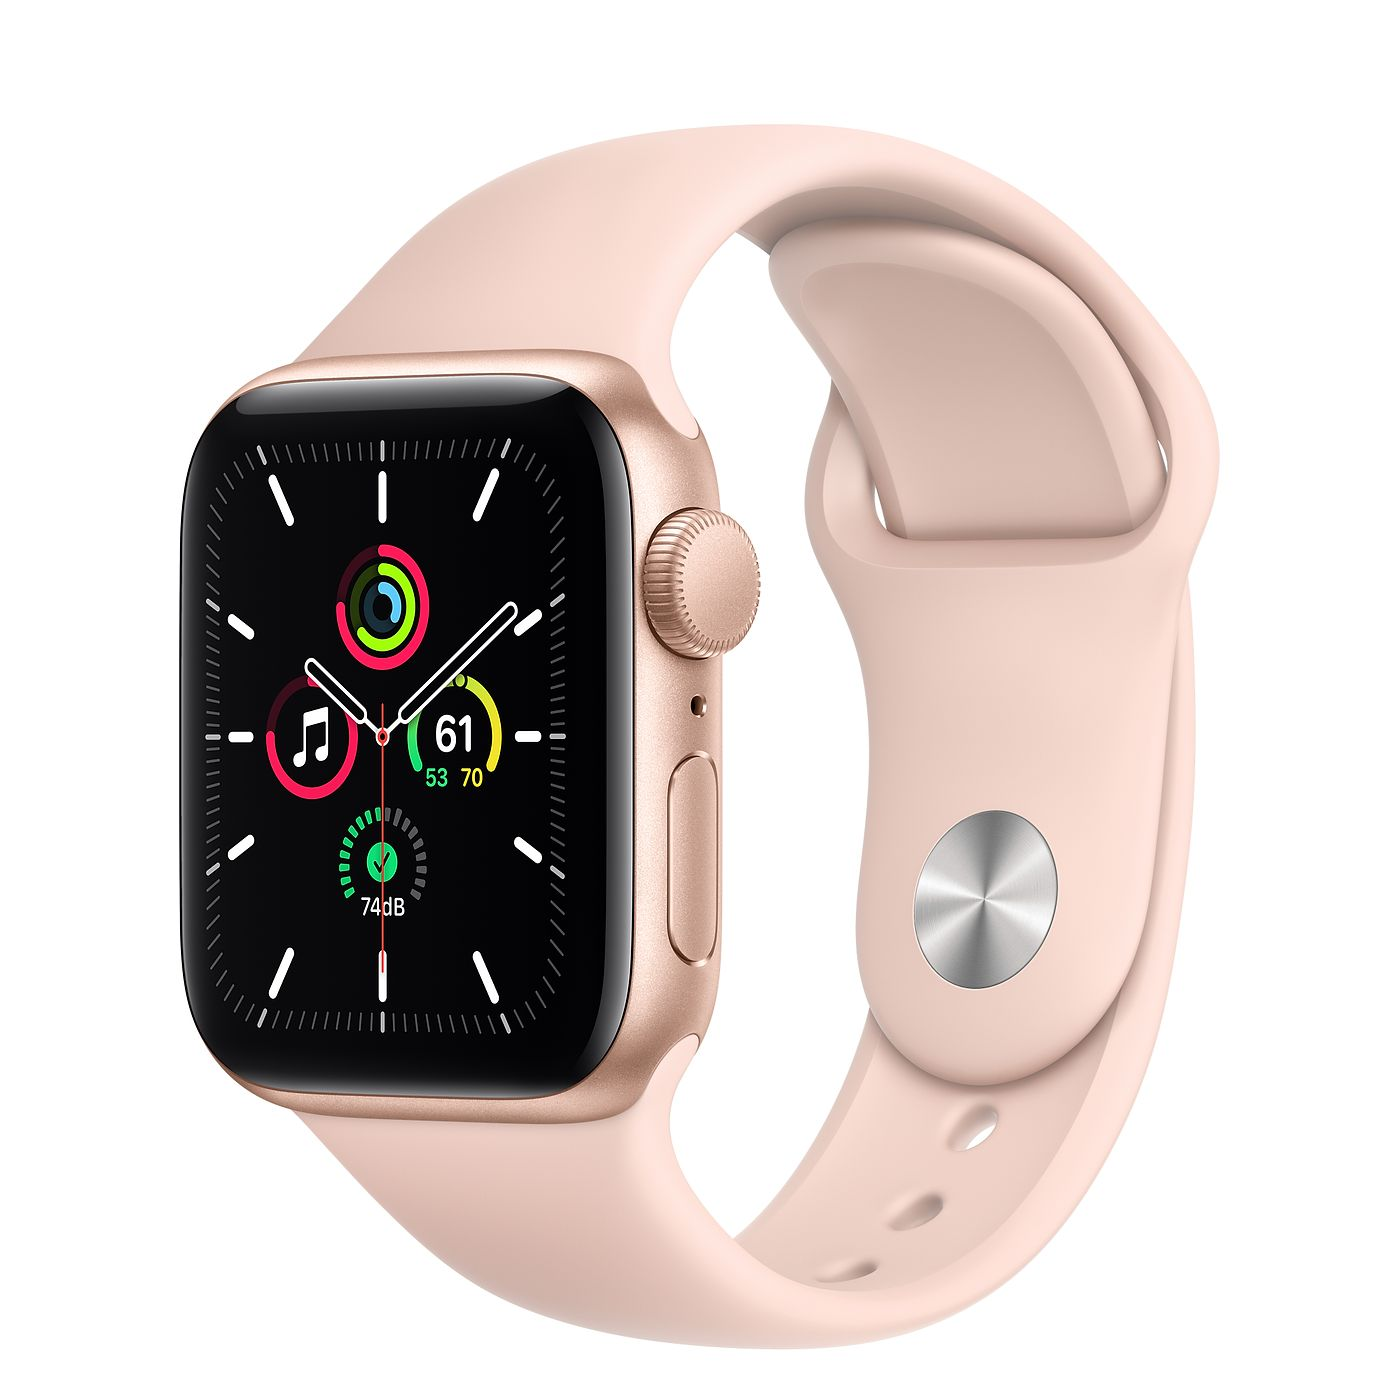 Apple 2020년 애플워치 SE, GPS, 골드 알루미늄 케이스, 핑크샌드 스포츠 밴드